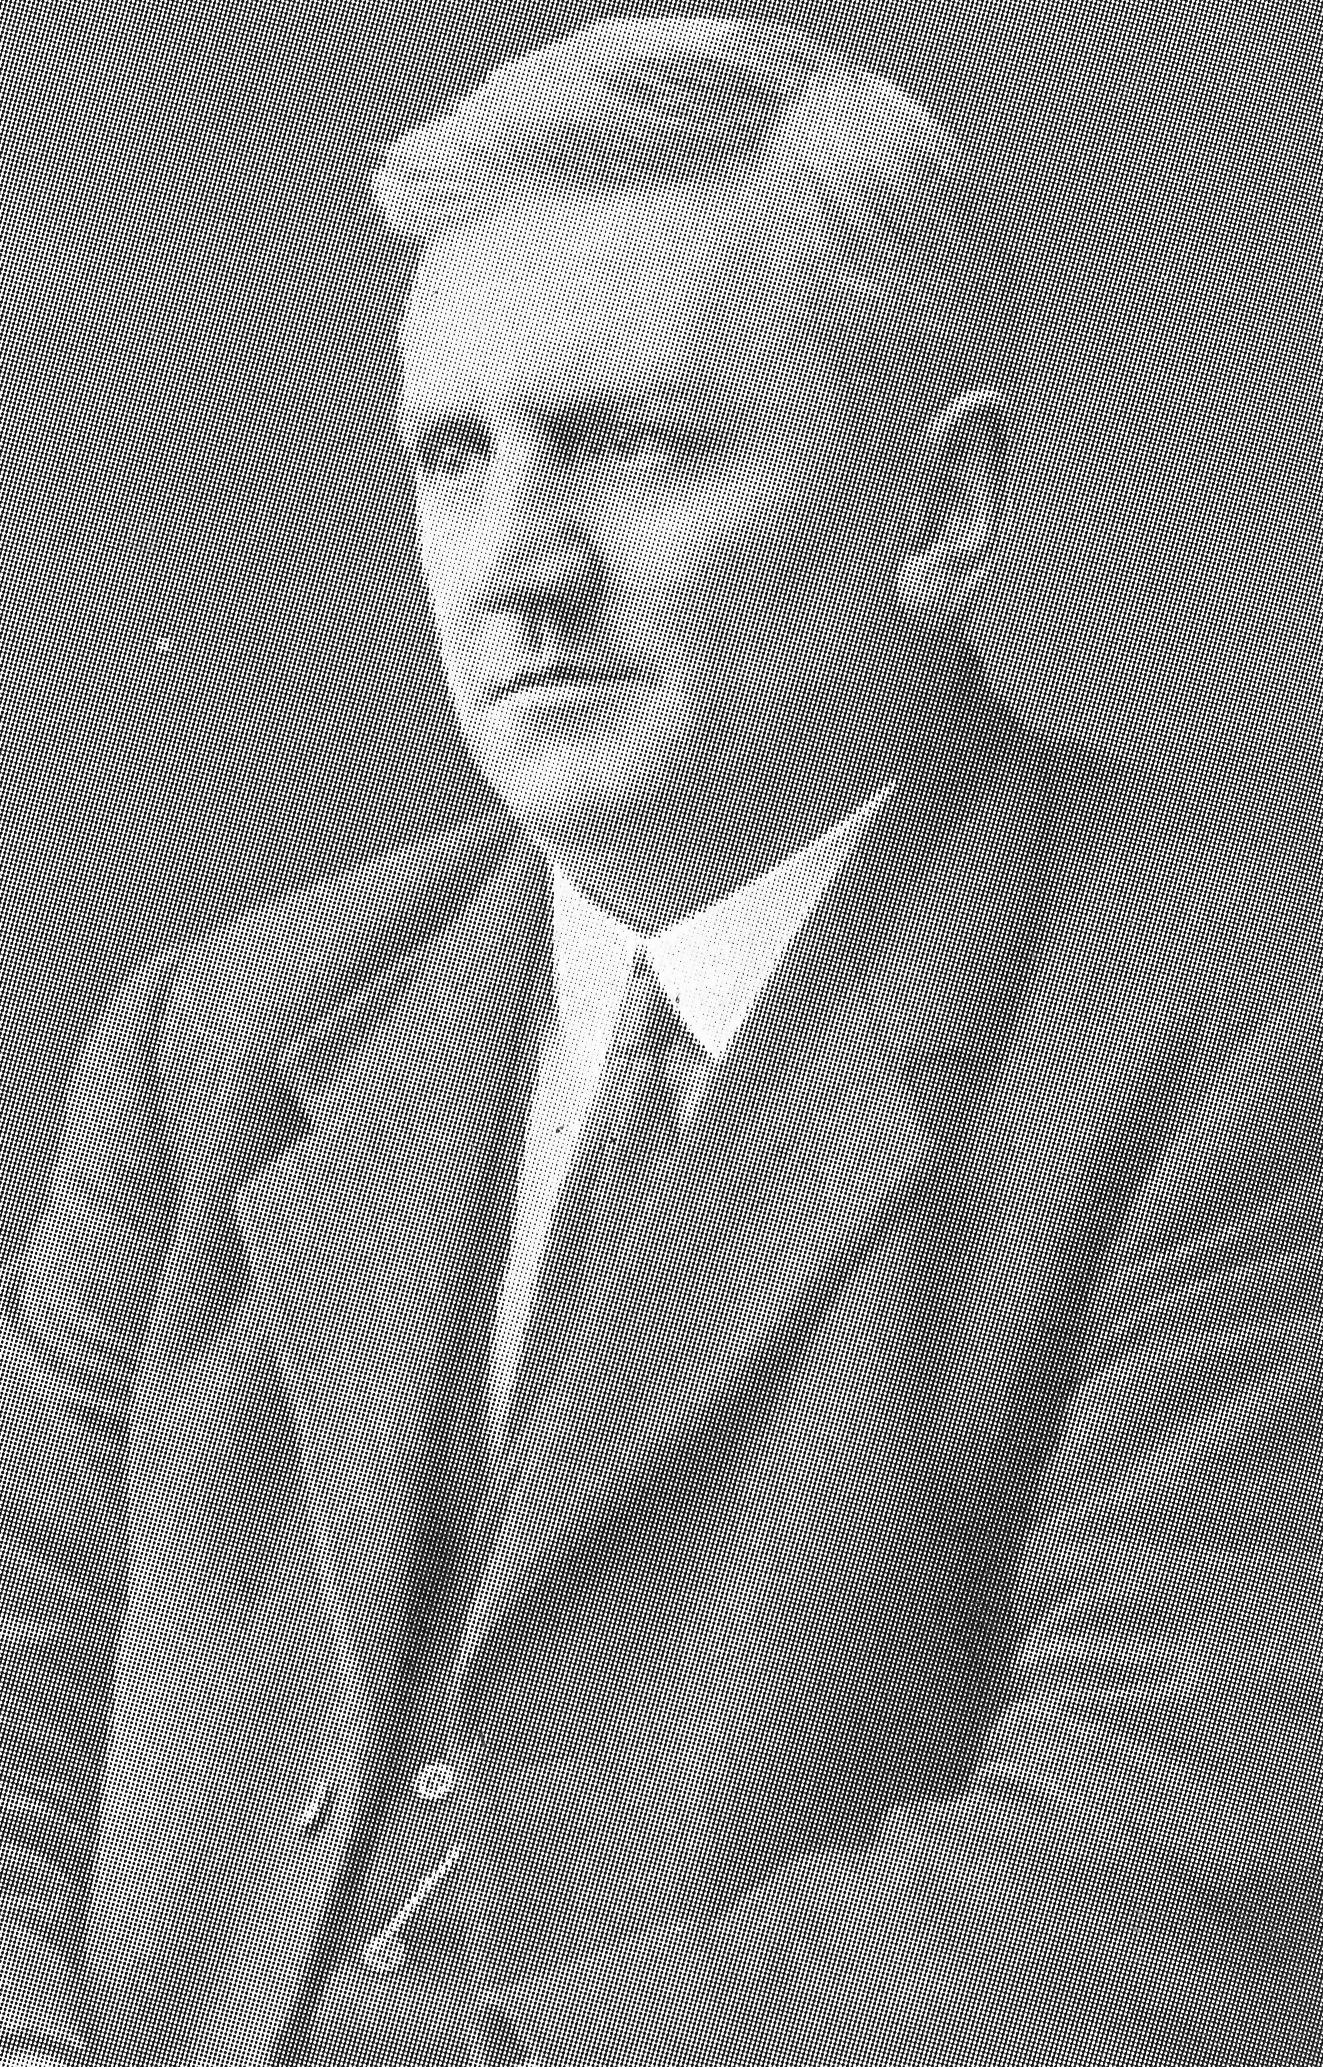 Thomas Rayner Dawson (28-xi-1889 16-xii-1951)